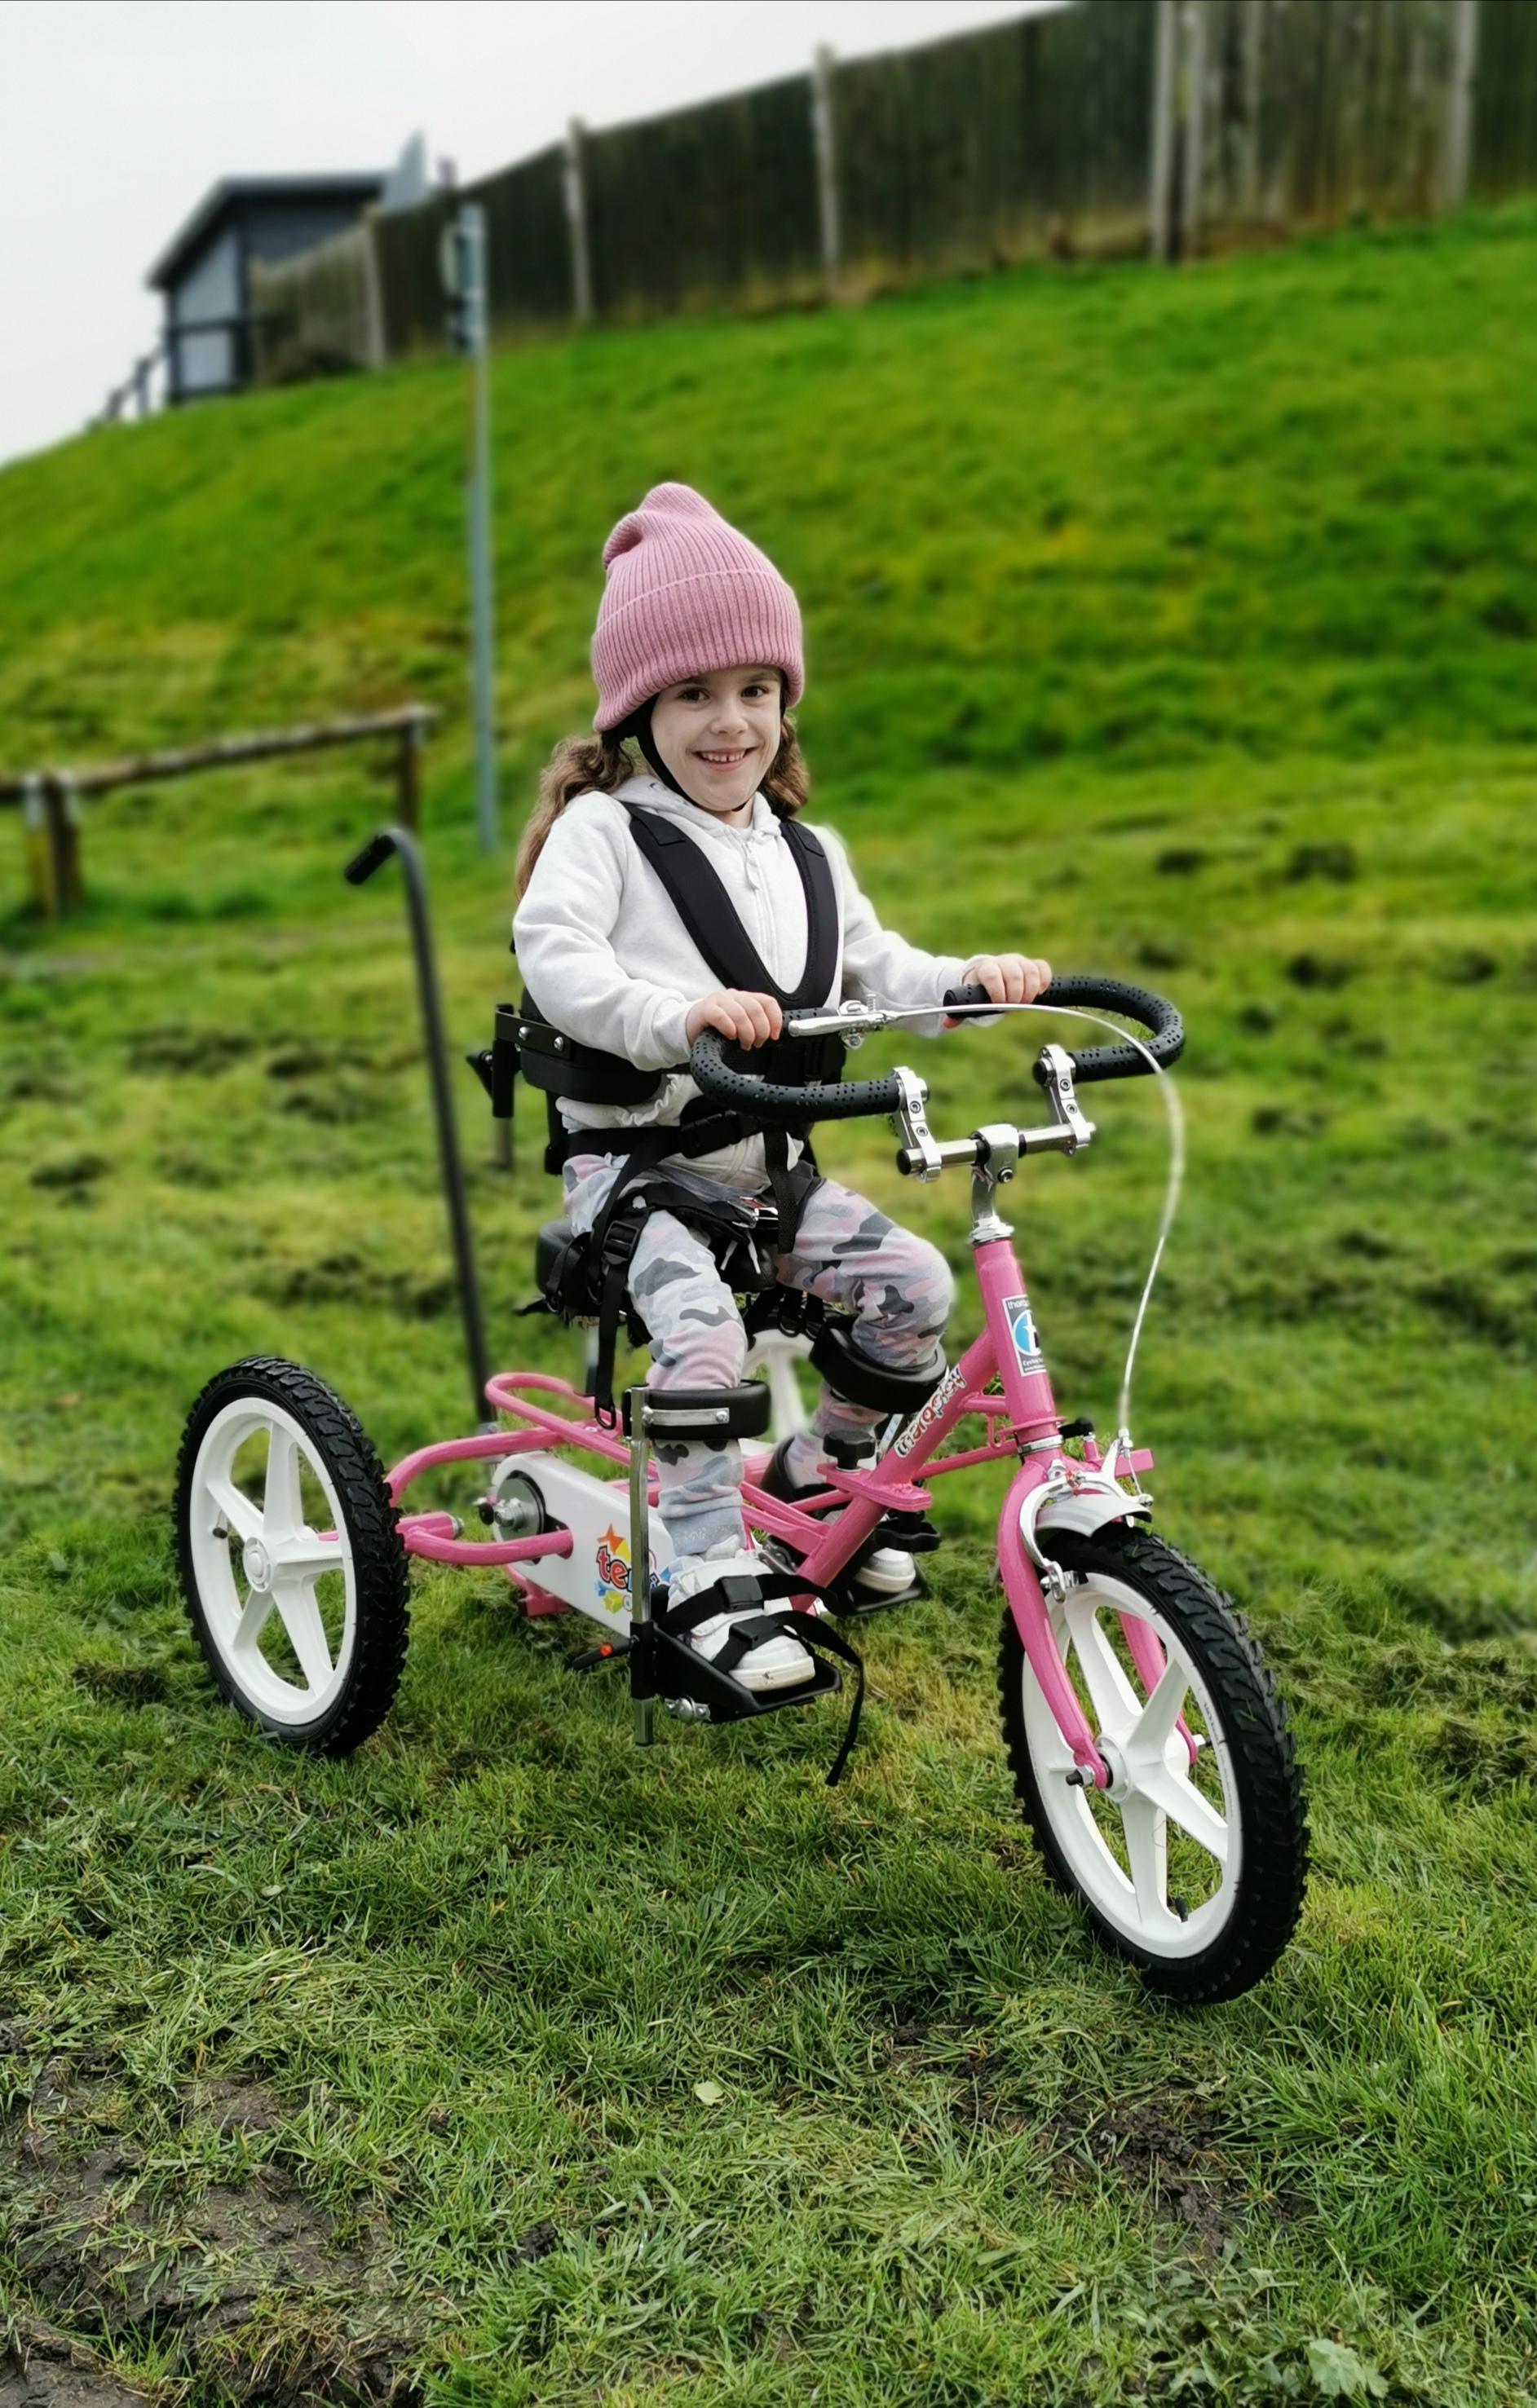 Carmela smiles as she poses on her pink Whizz-Kidz trike